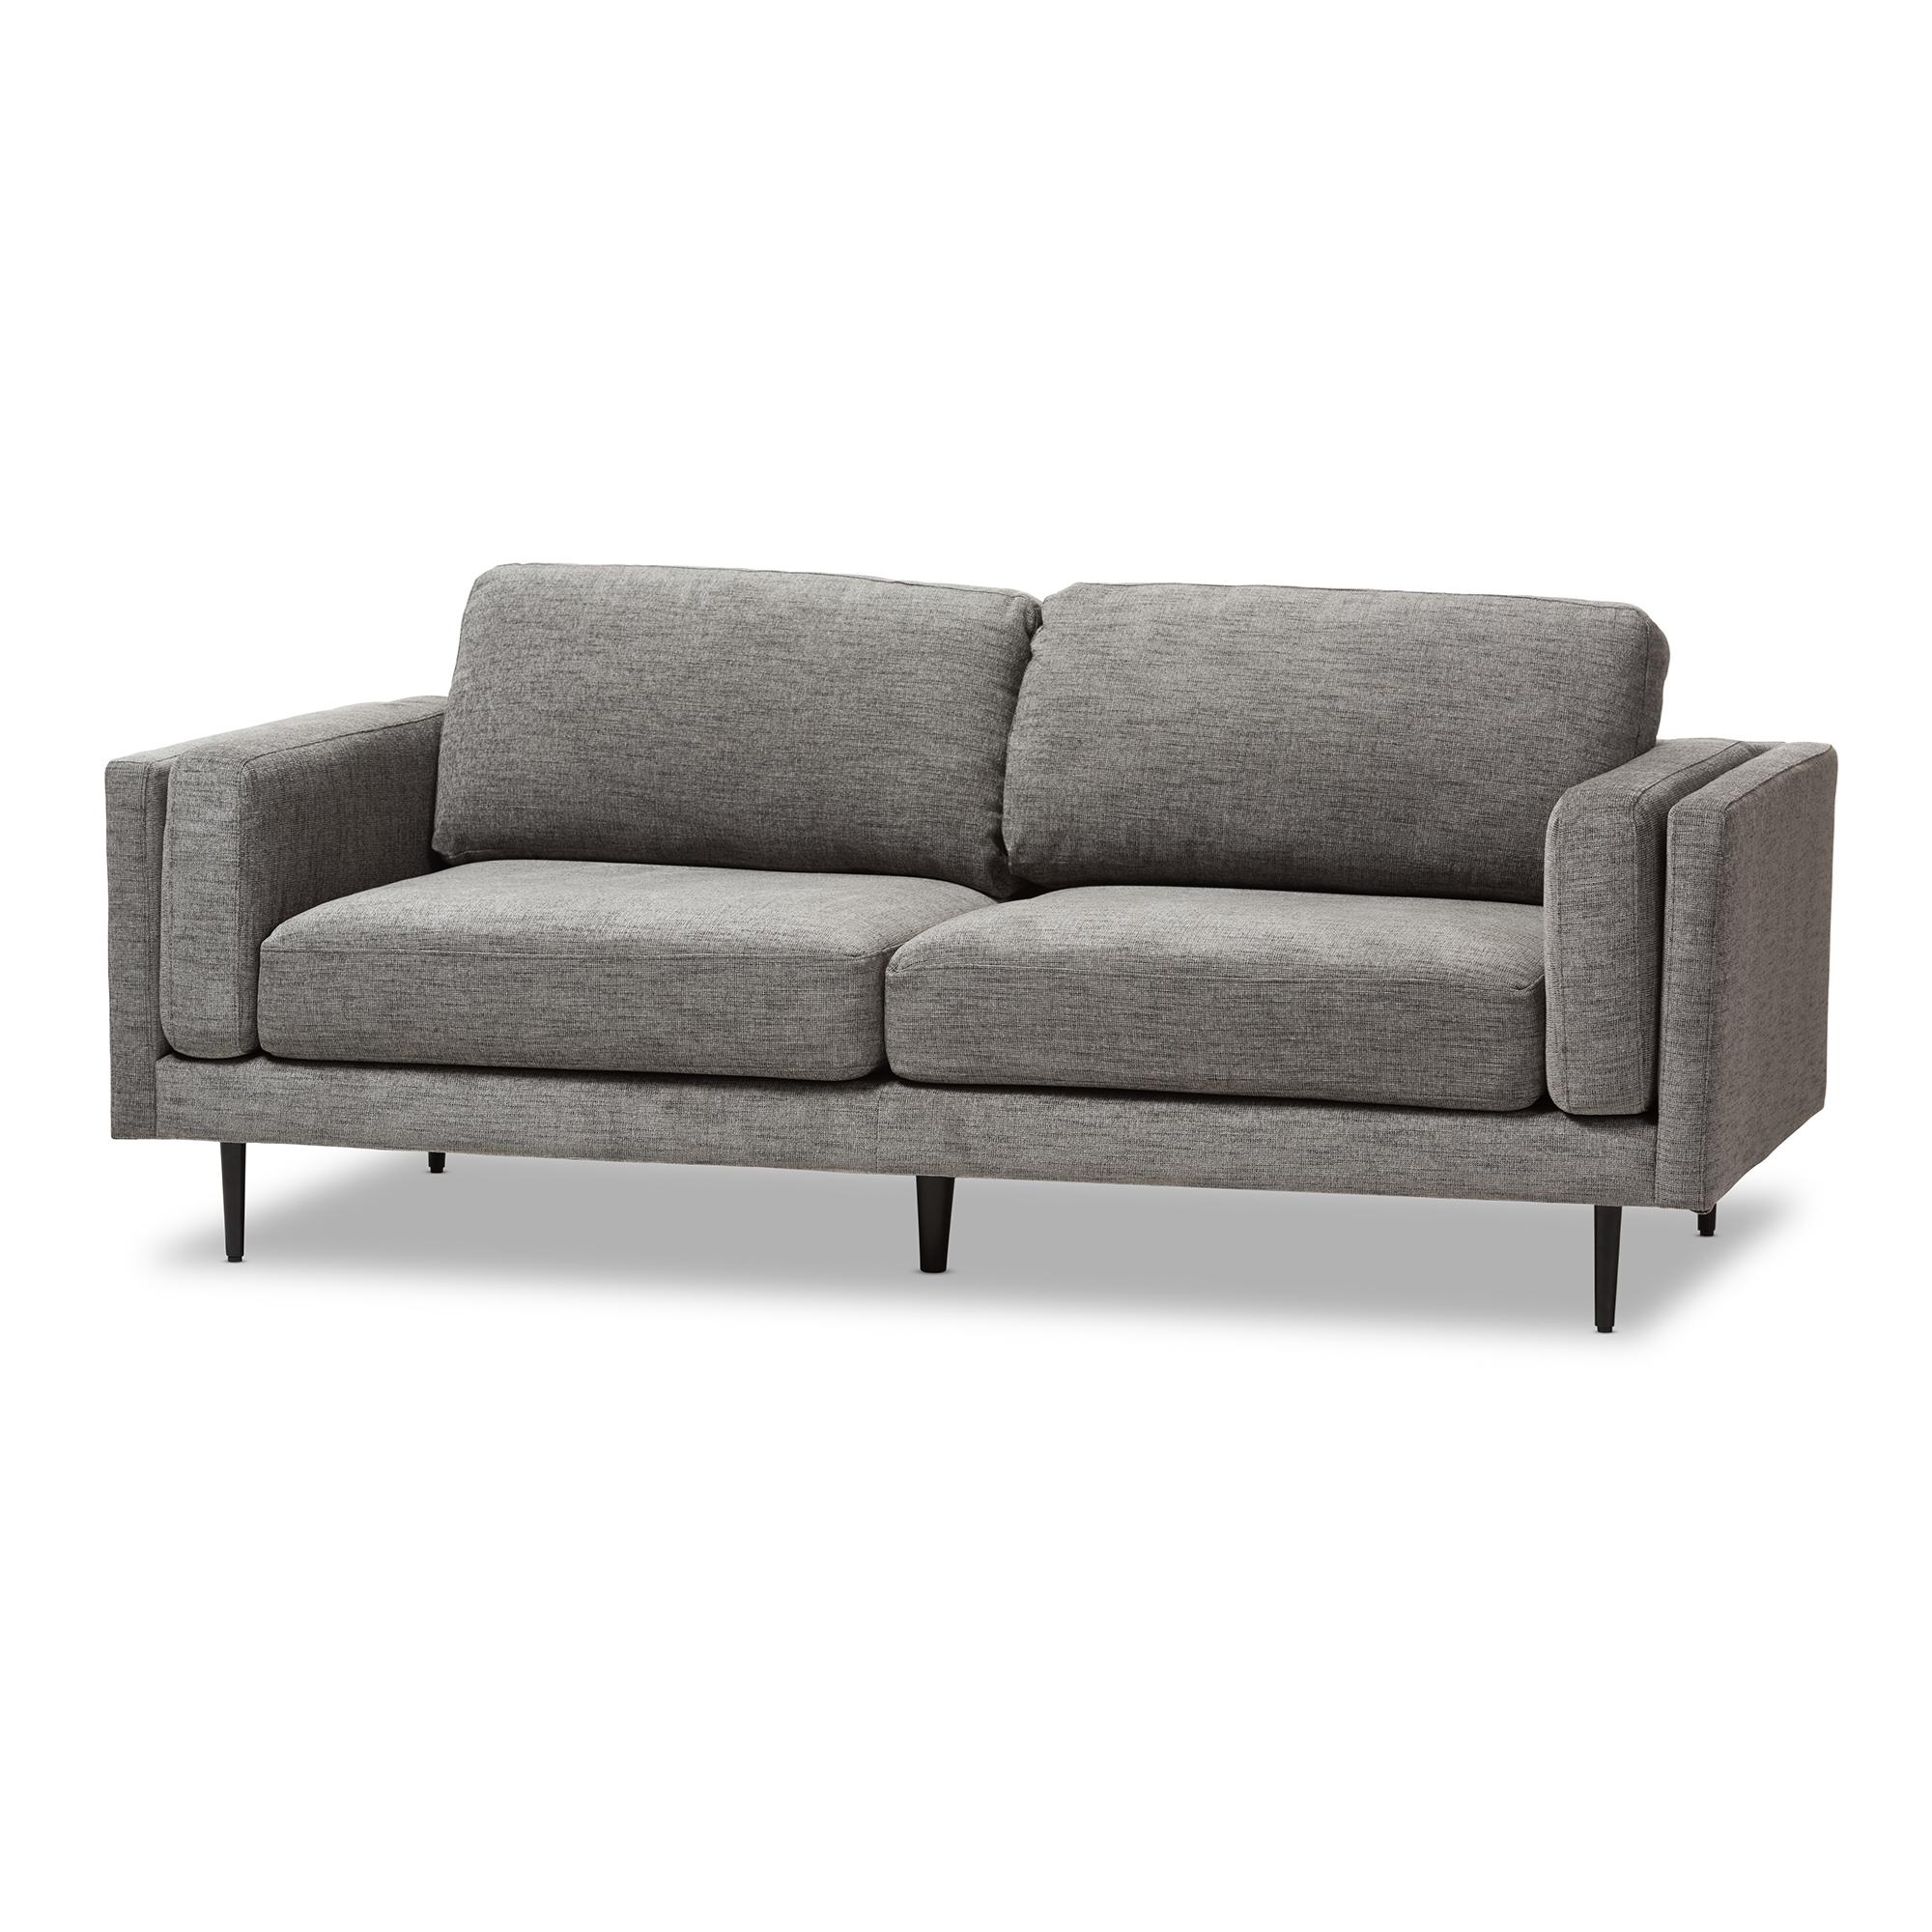 Baxton Studio Brittany Retro Mid Century Modern Grey Fabric Upholstered  3 Seater Loveseat ...